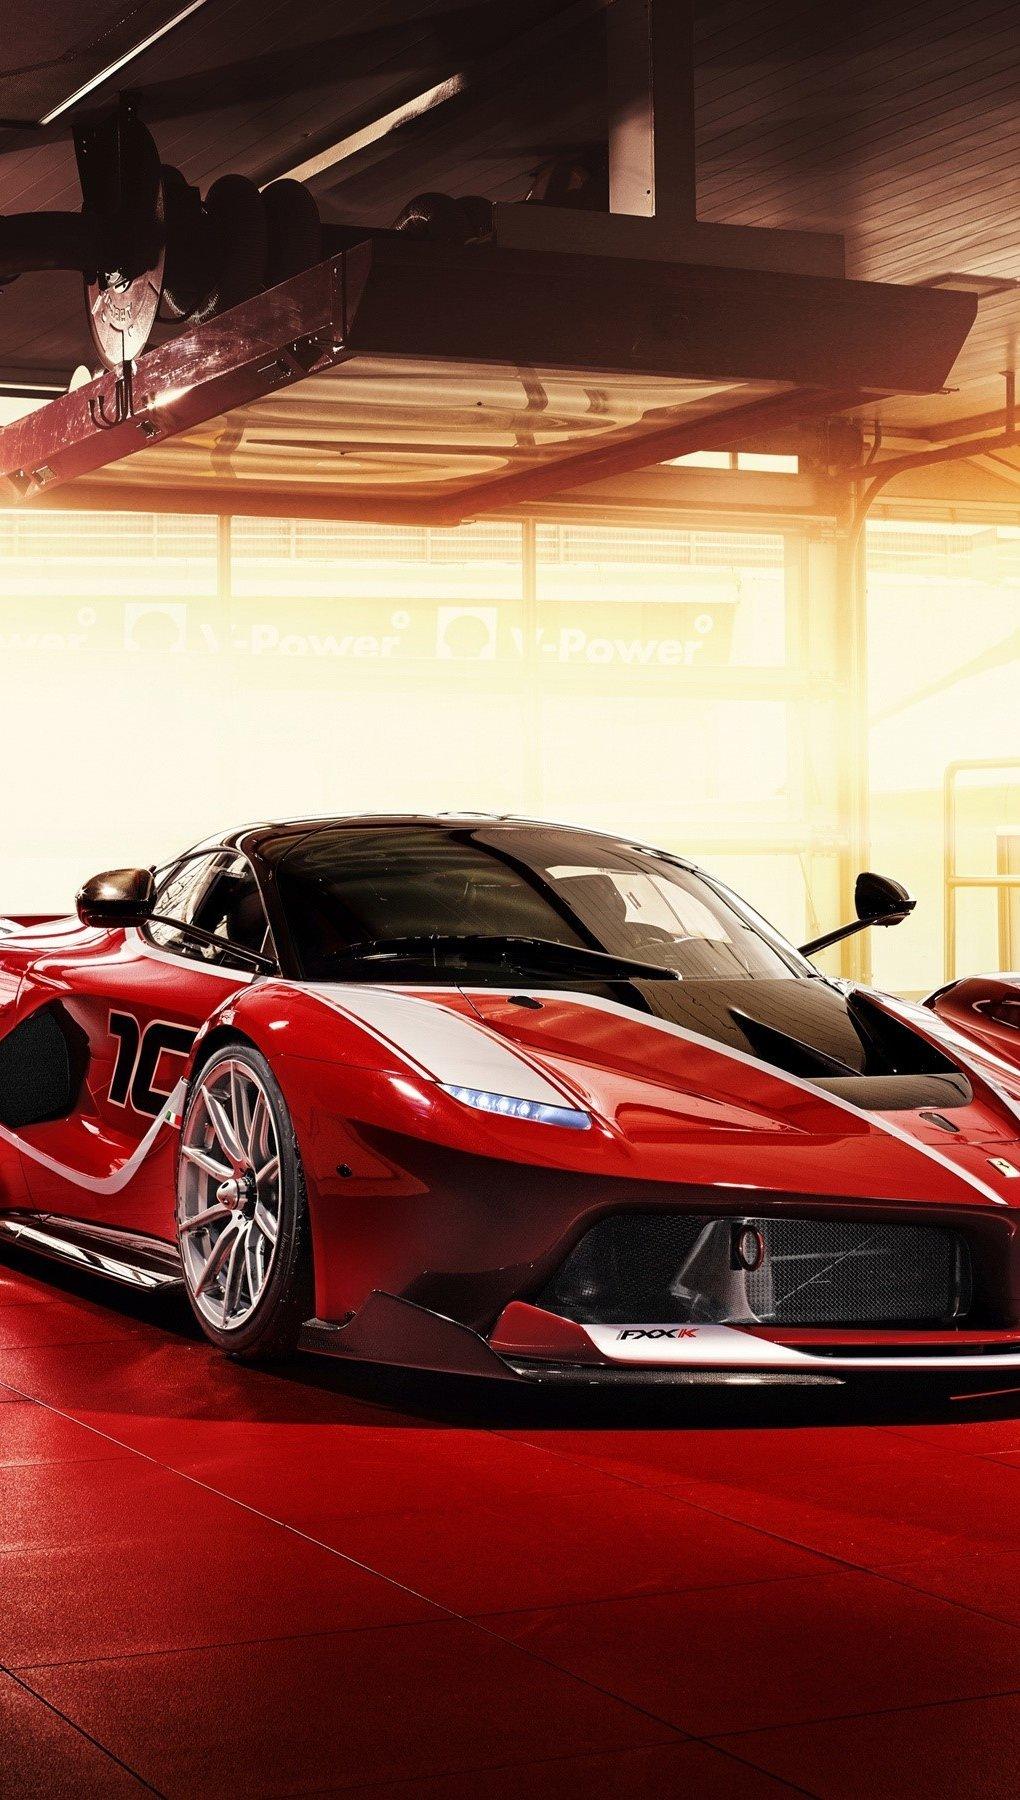 Wallpaper Ferrari FXX K 2015 Vertical